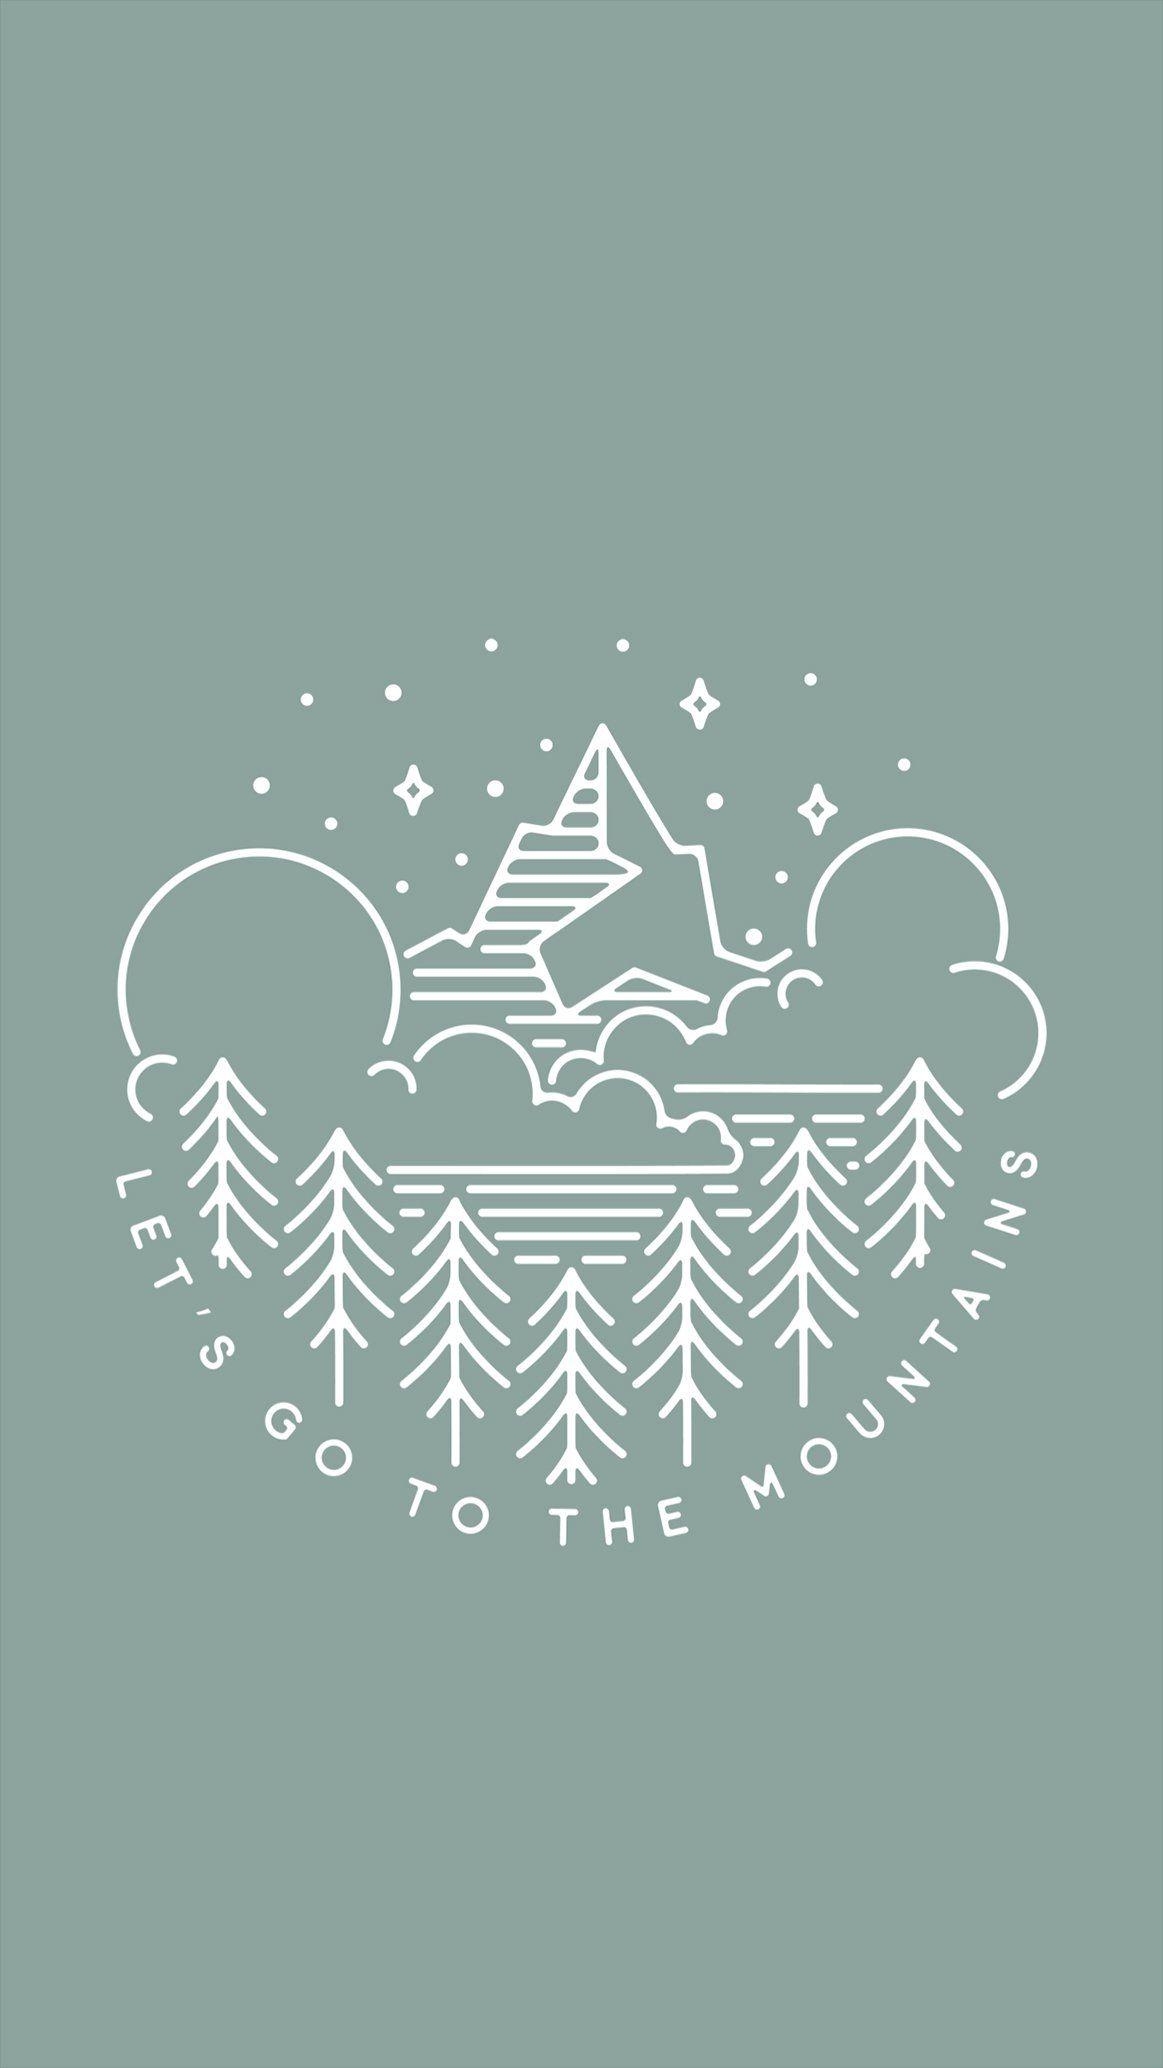 Let S Go To The Mountains Arvo Wallpaper Be Good Do Good Arvo Arvowear Arvo Iphone Wallpaper Mountains Iphone Background Wallpaper Iphone Wallpaper